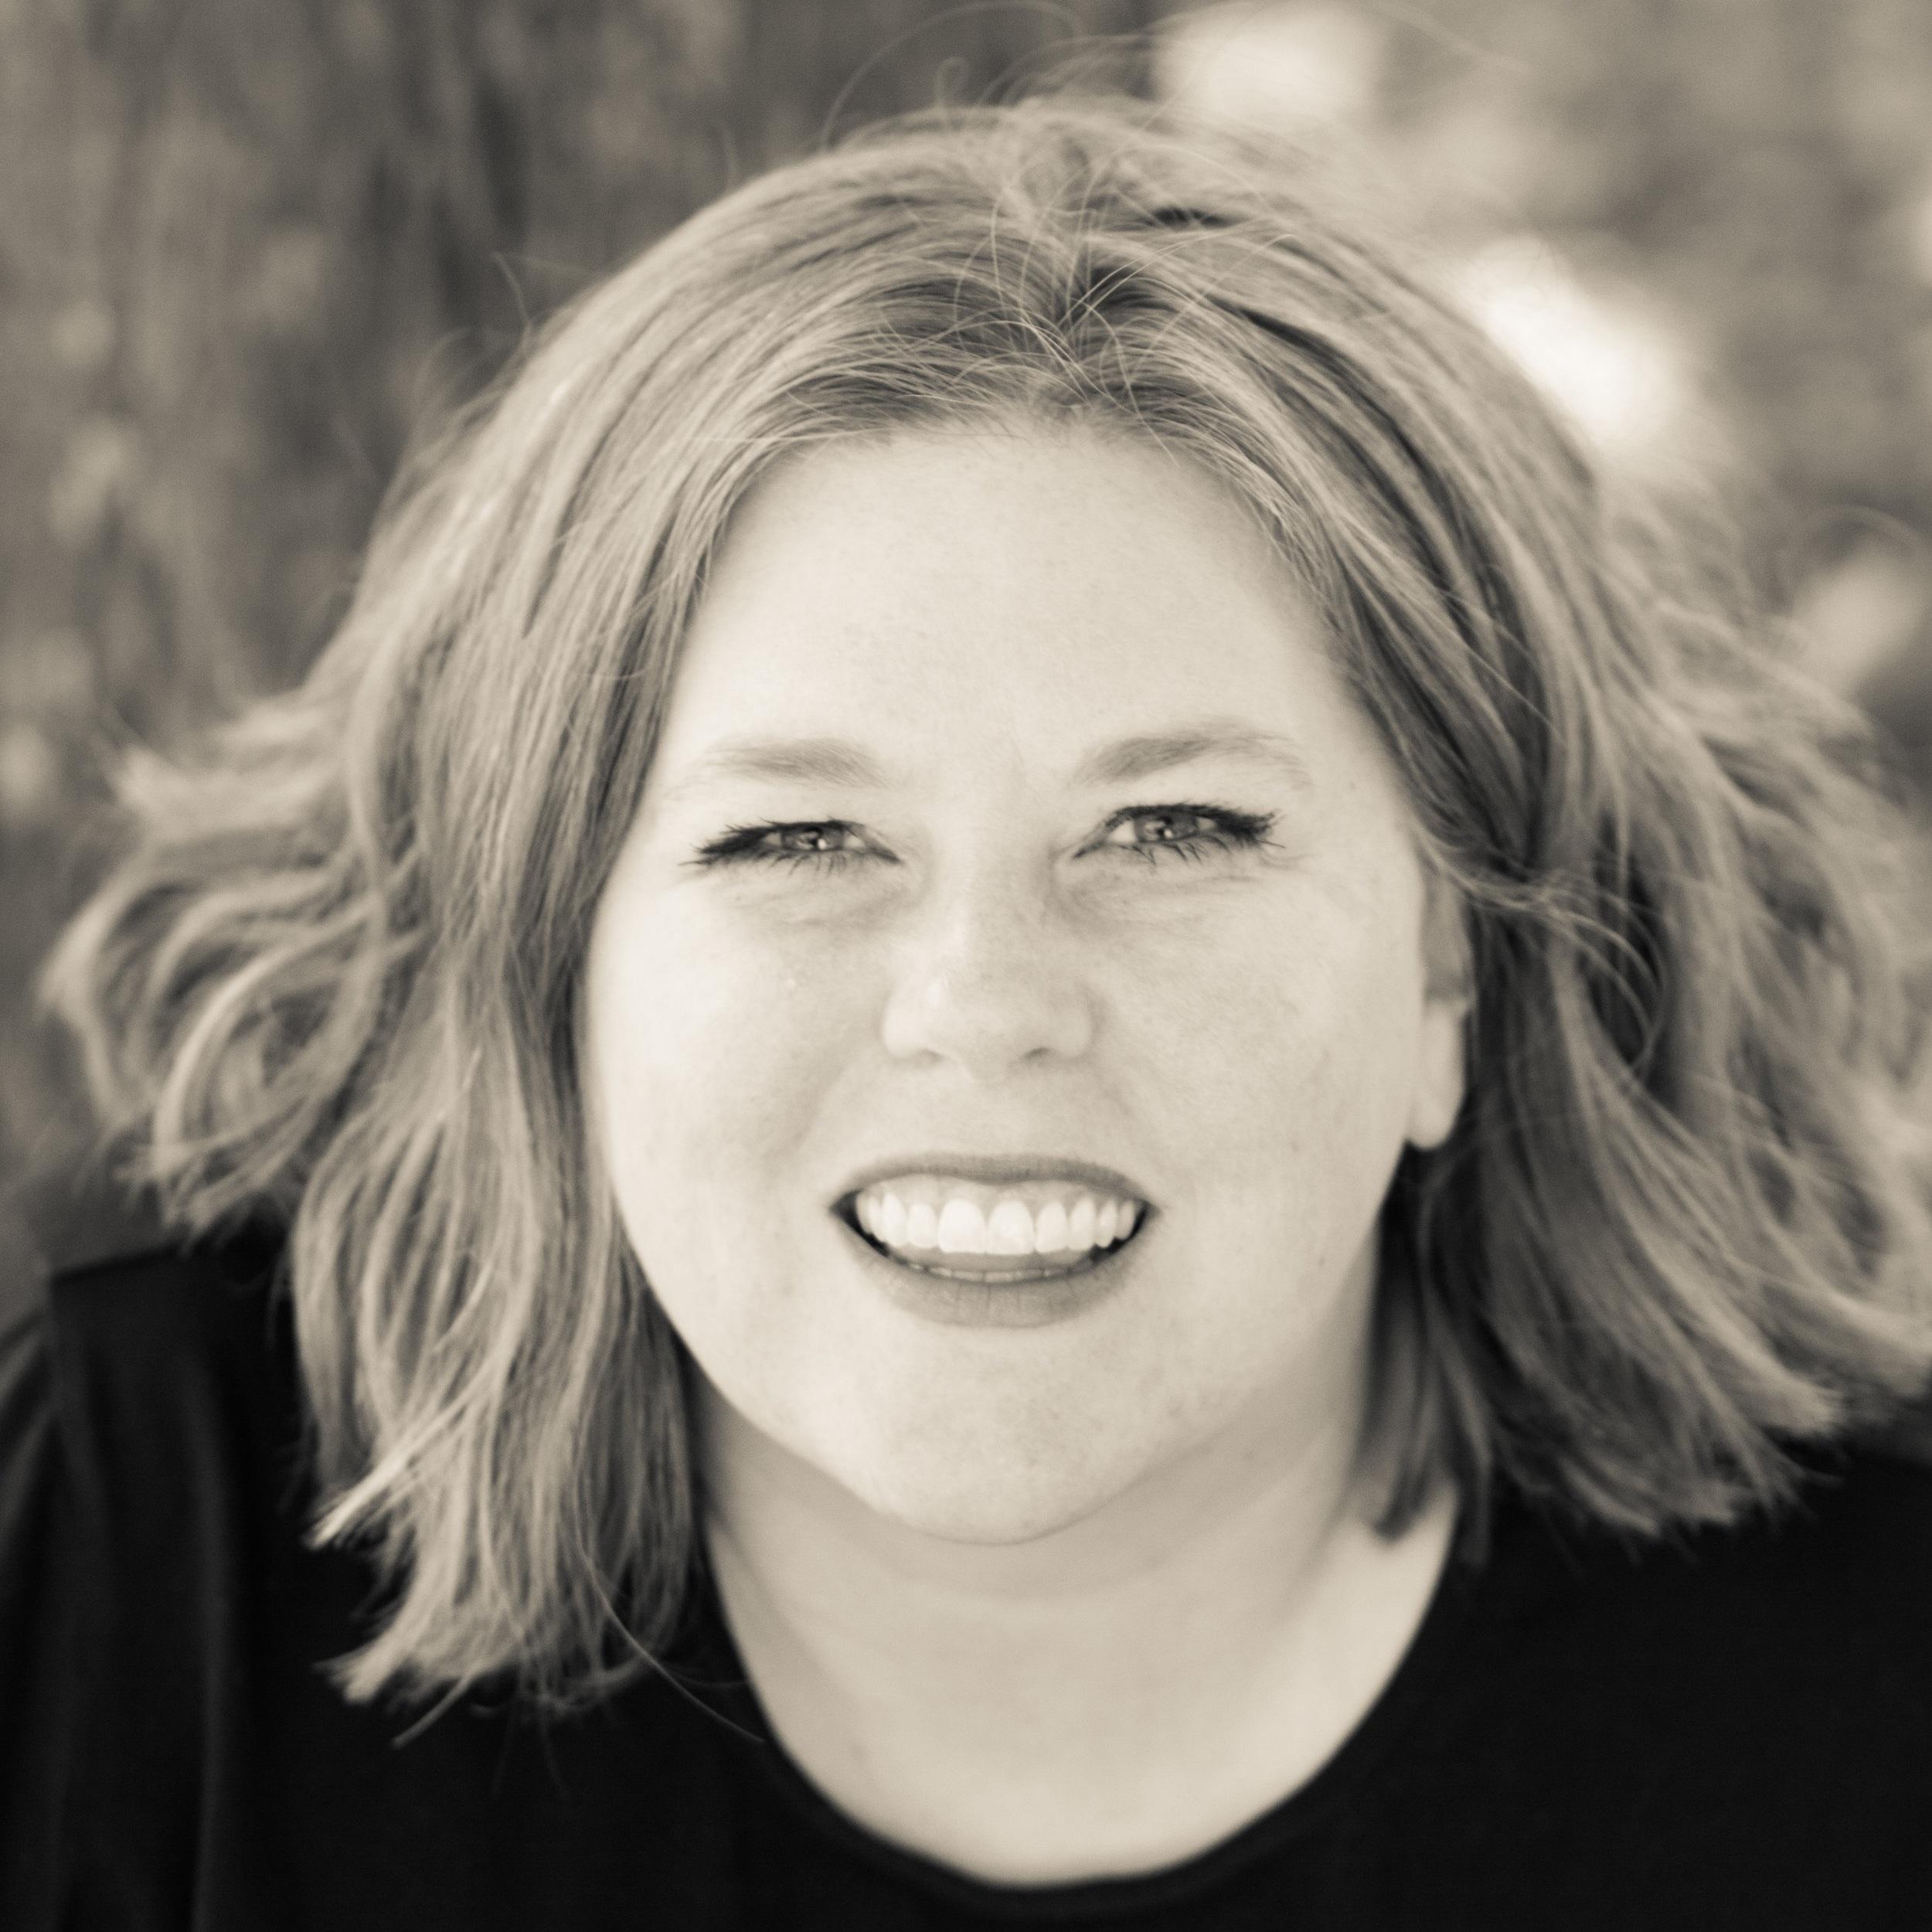 Angela K. Nickerson writer + photographer + traveler